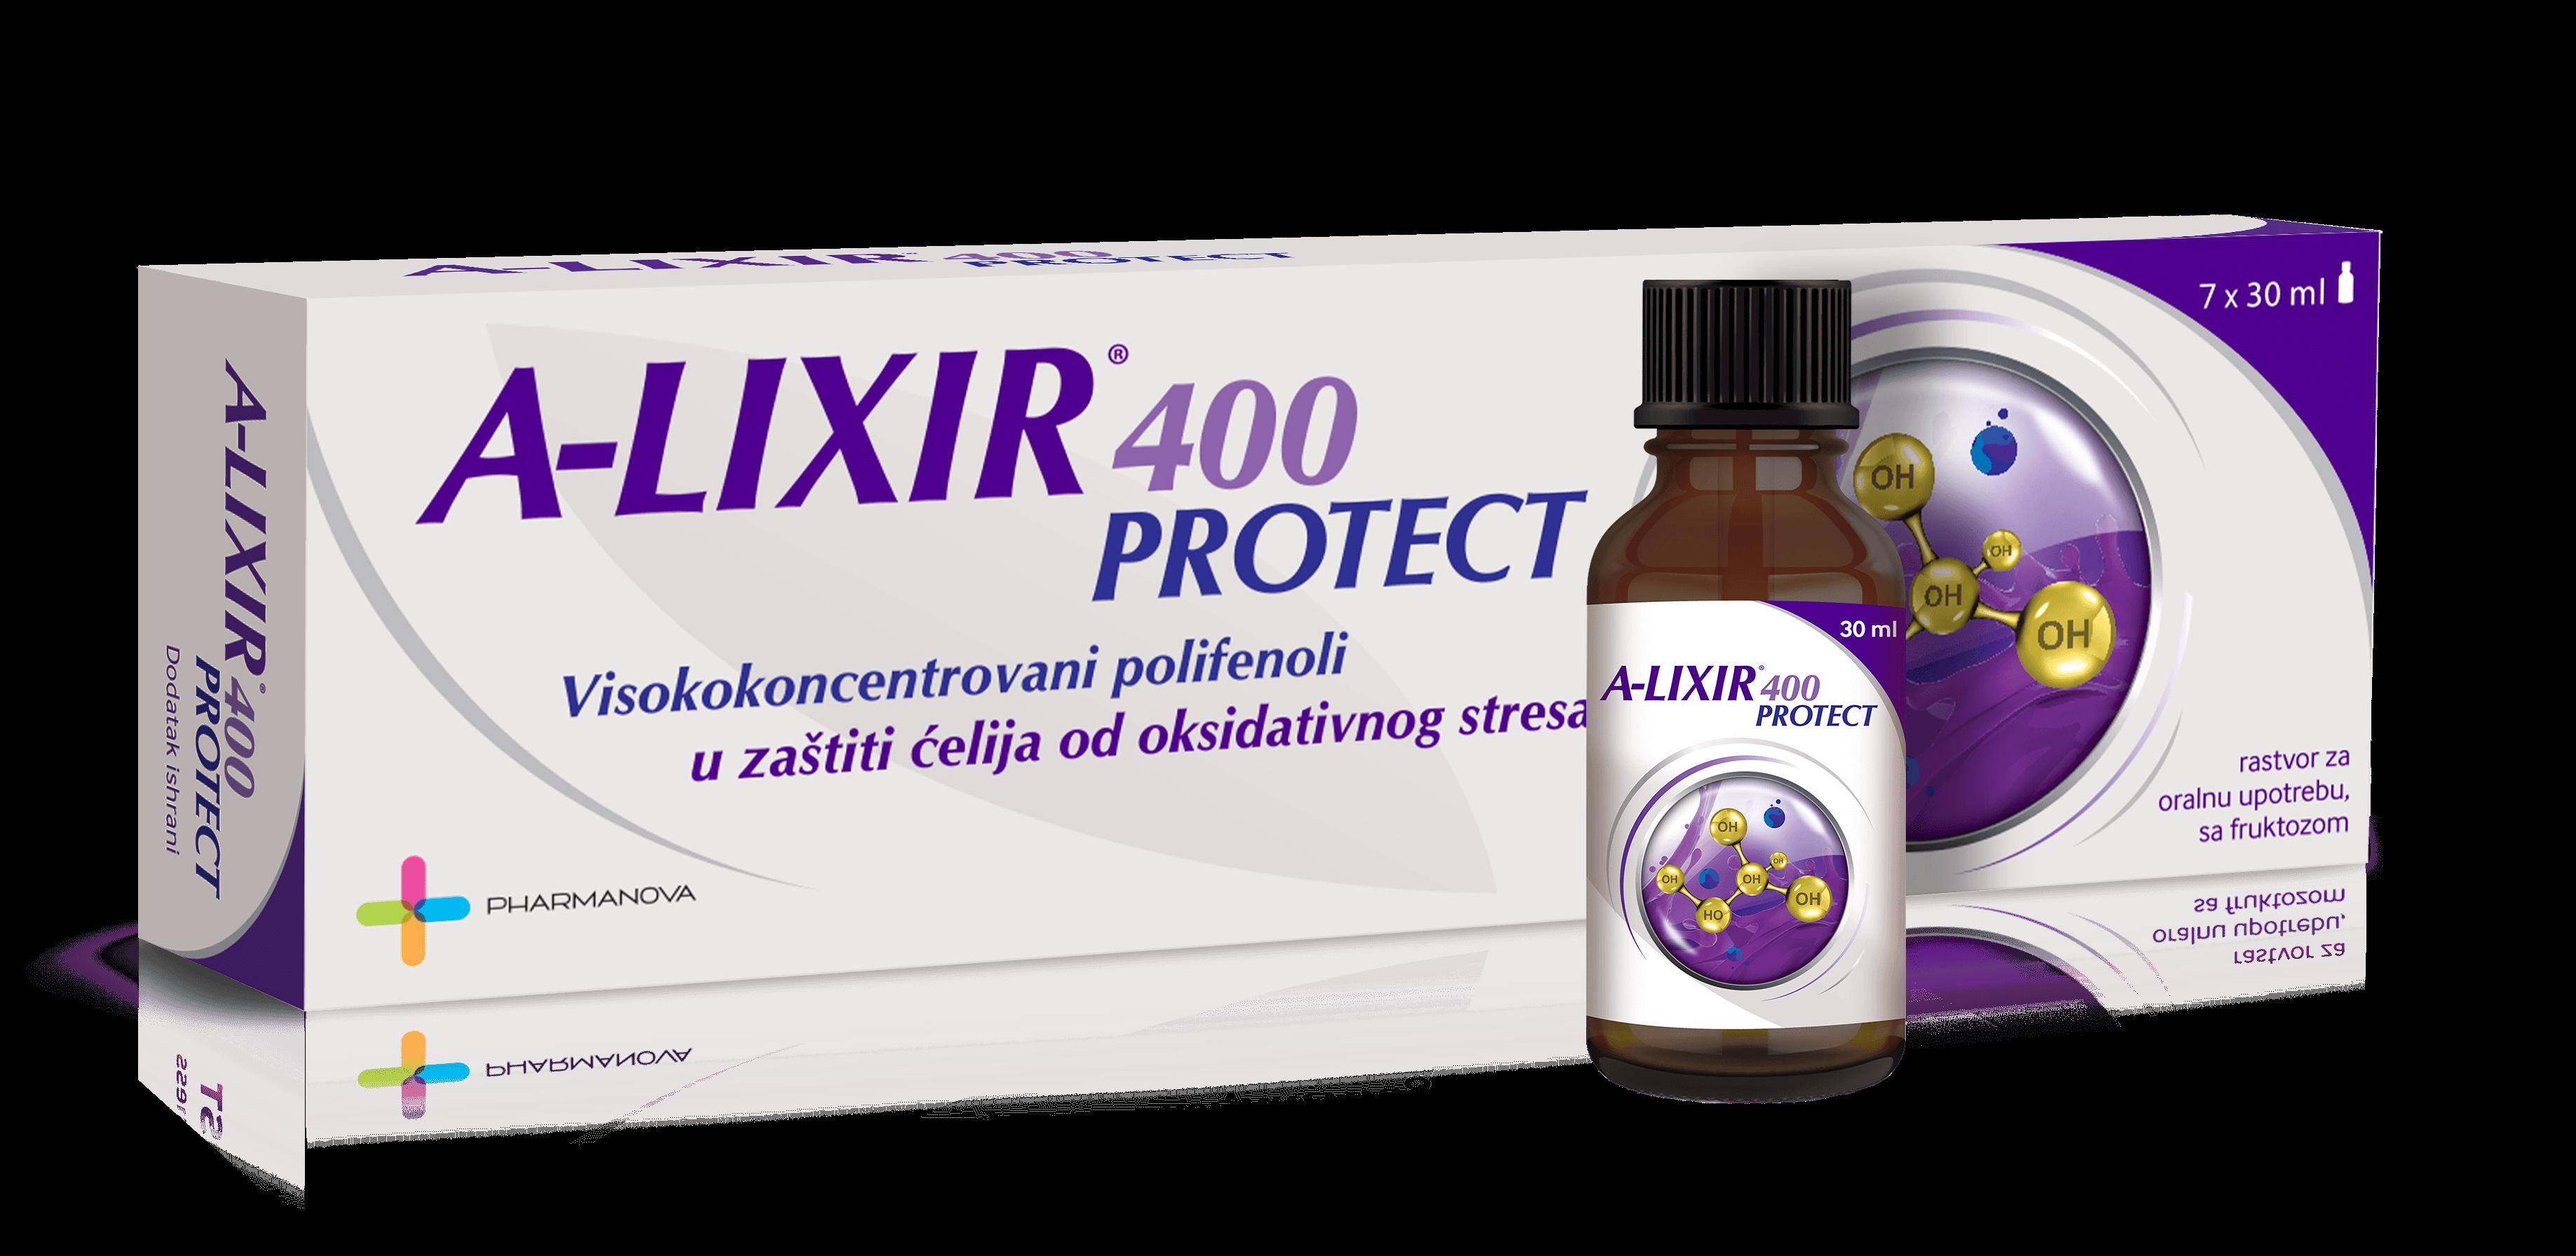 Najjači antioksidans, prirodna riznica polifenola